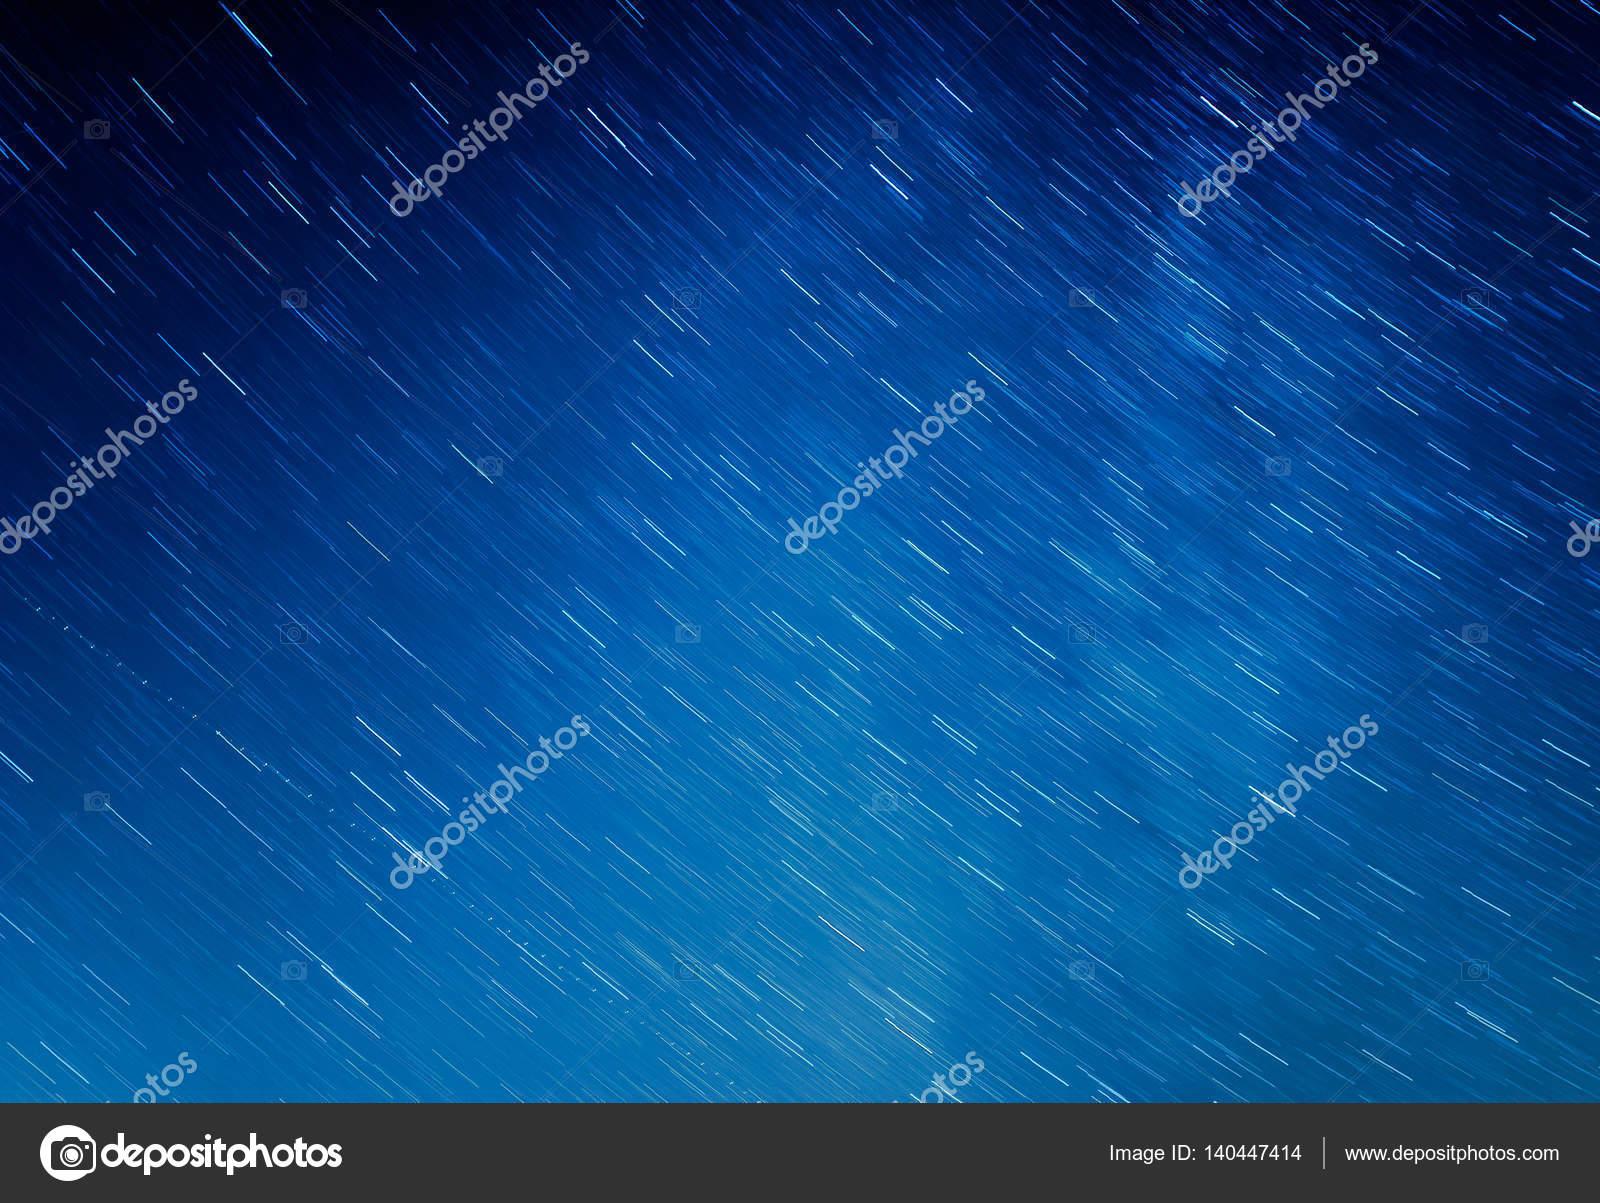 Beautiful Scenery Of Blue Night Sky With Stars Star Trails Photo By Tadeas